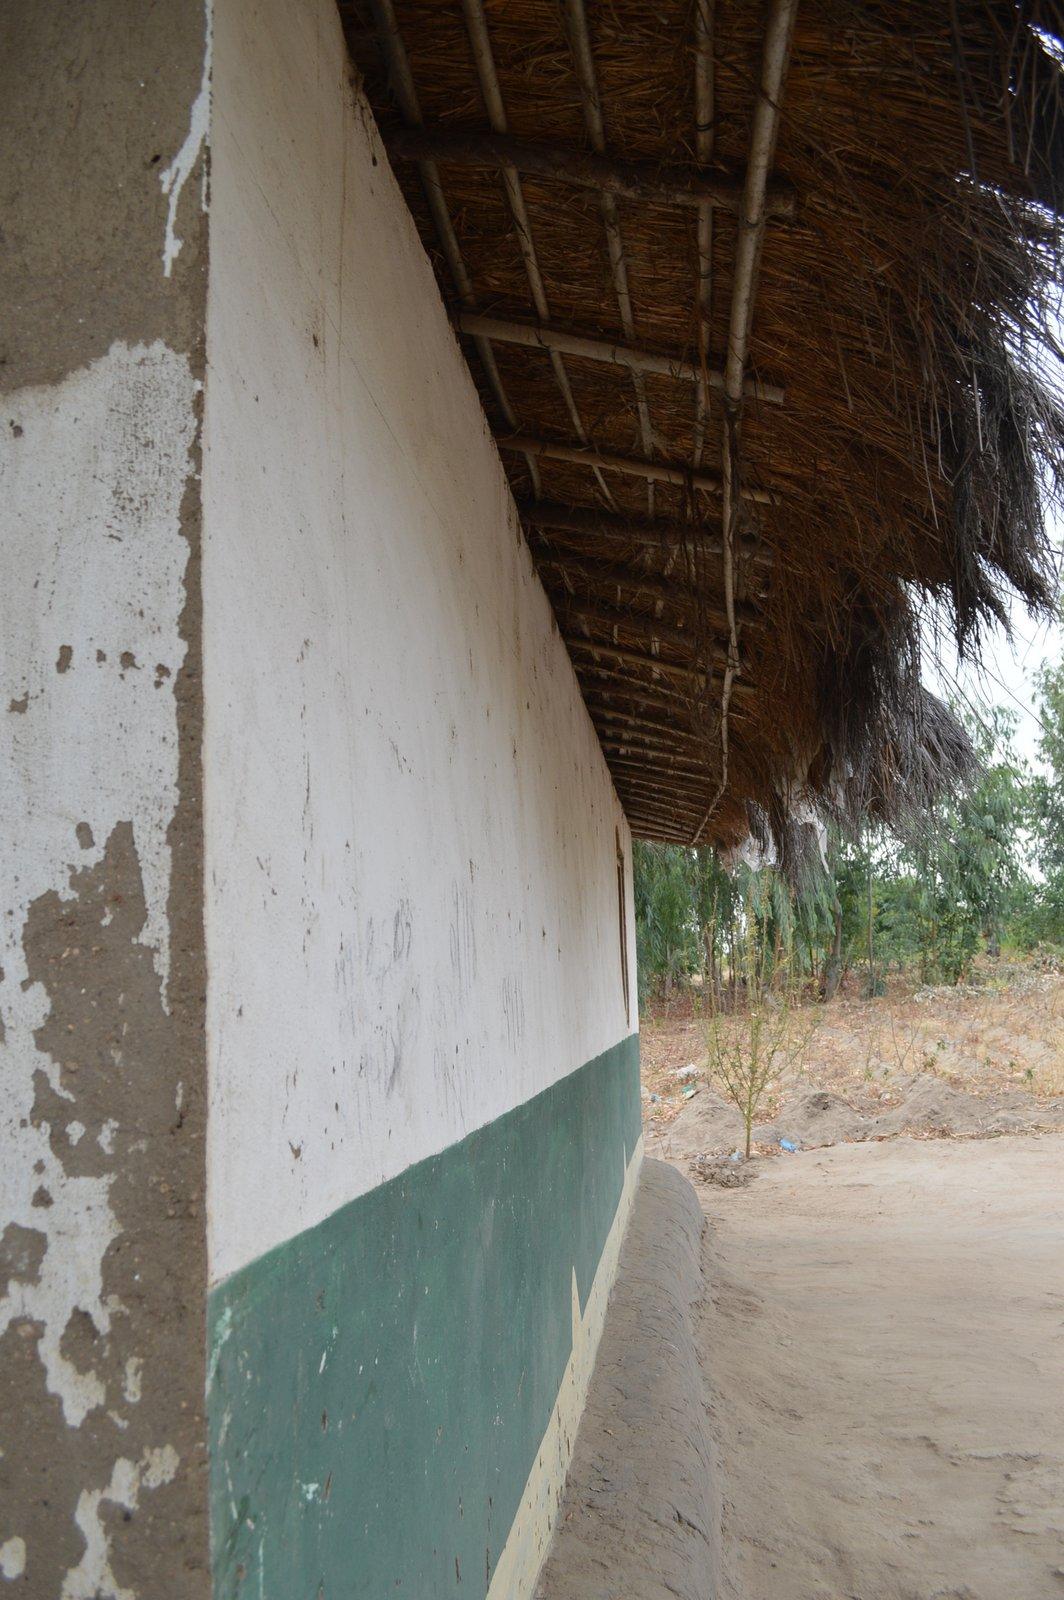 Chikasima, Nkhata Bay (14).JPG